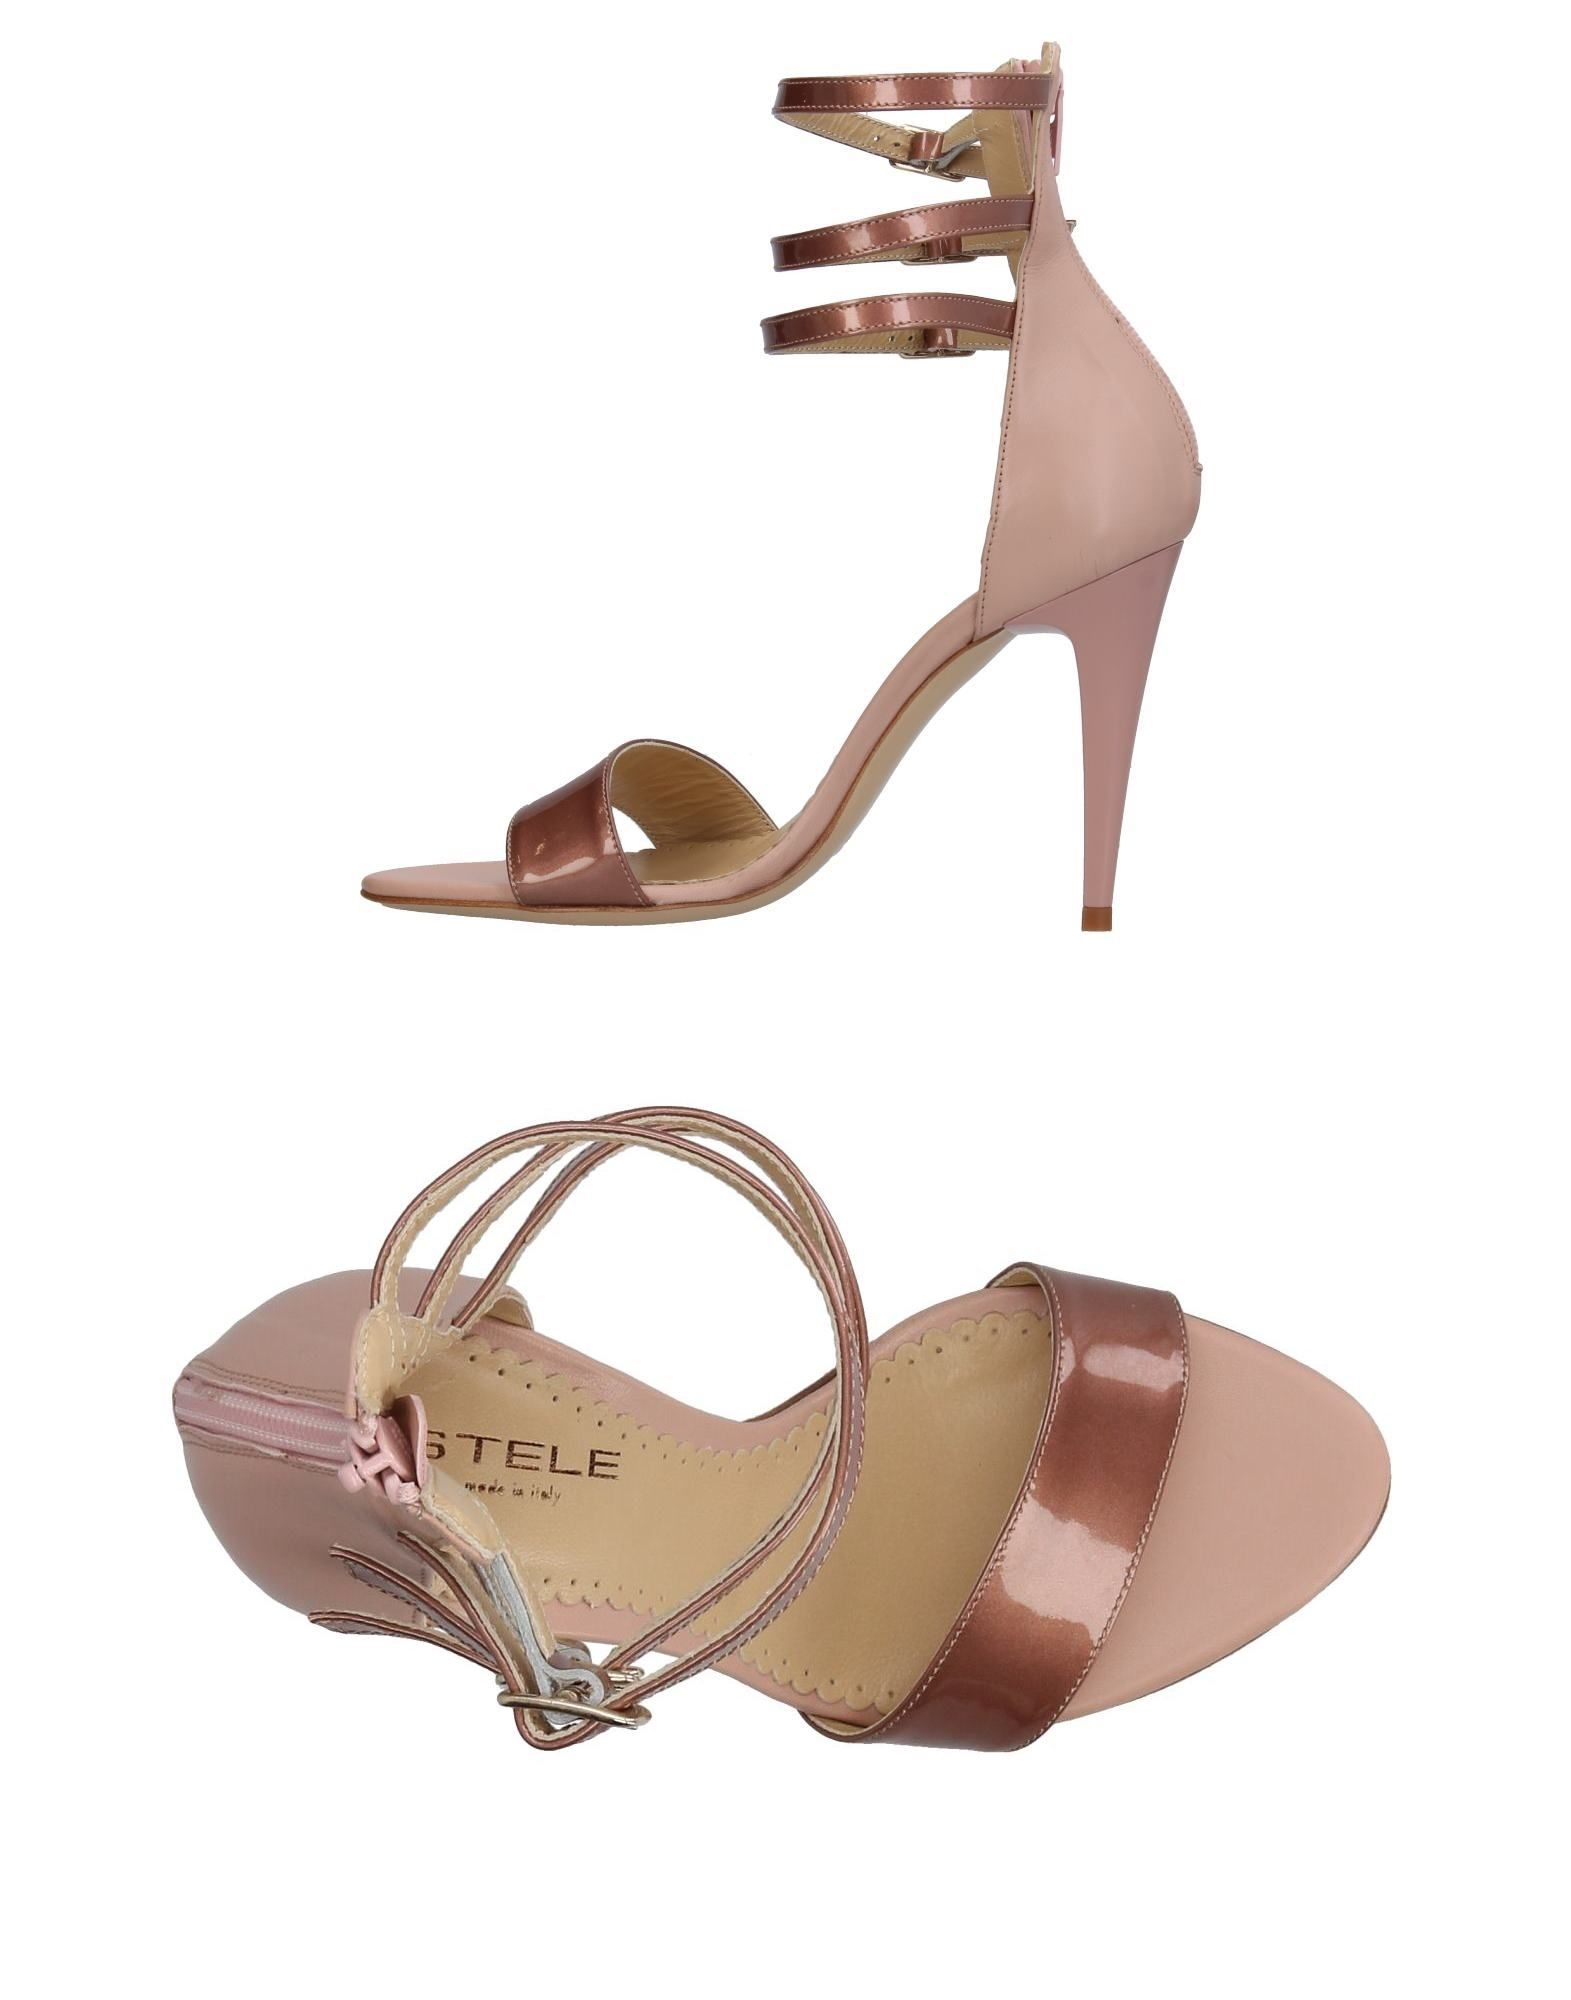 Stele Sandalen Damen  11376587LT Gute Qualität beliebte Schuhe